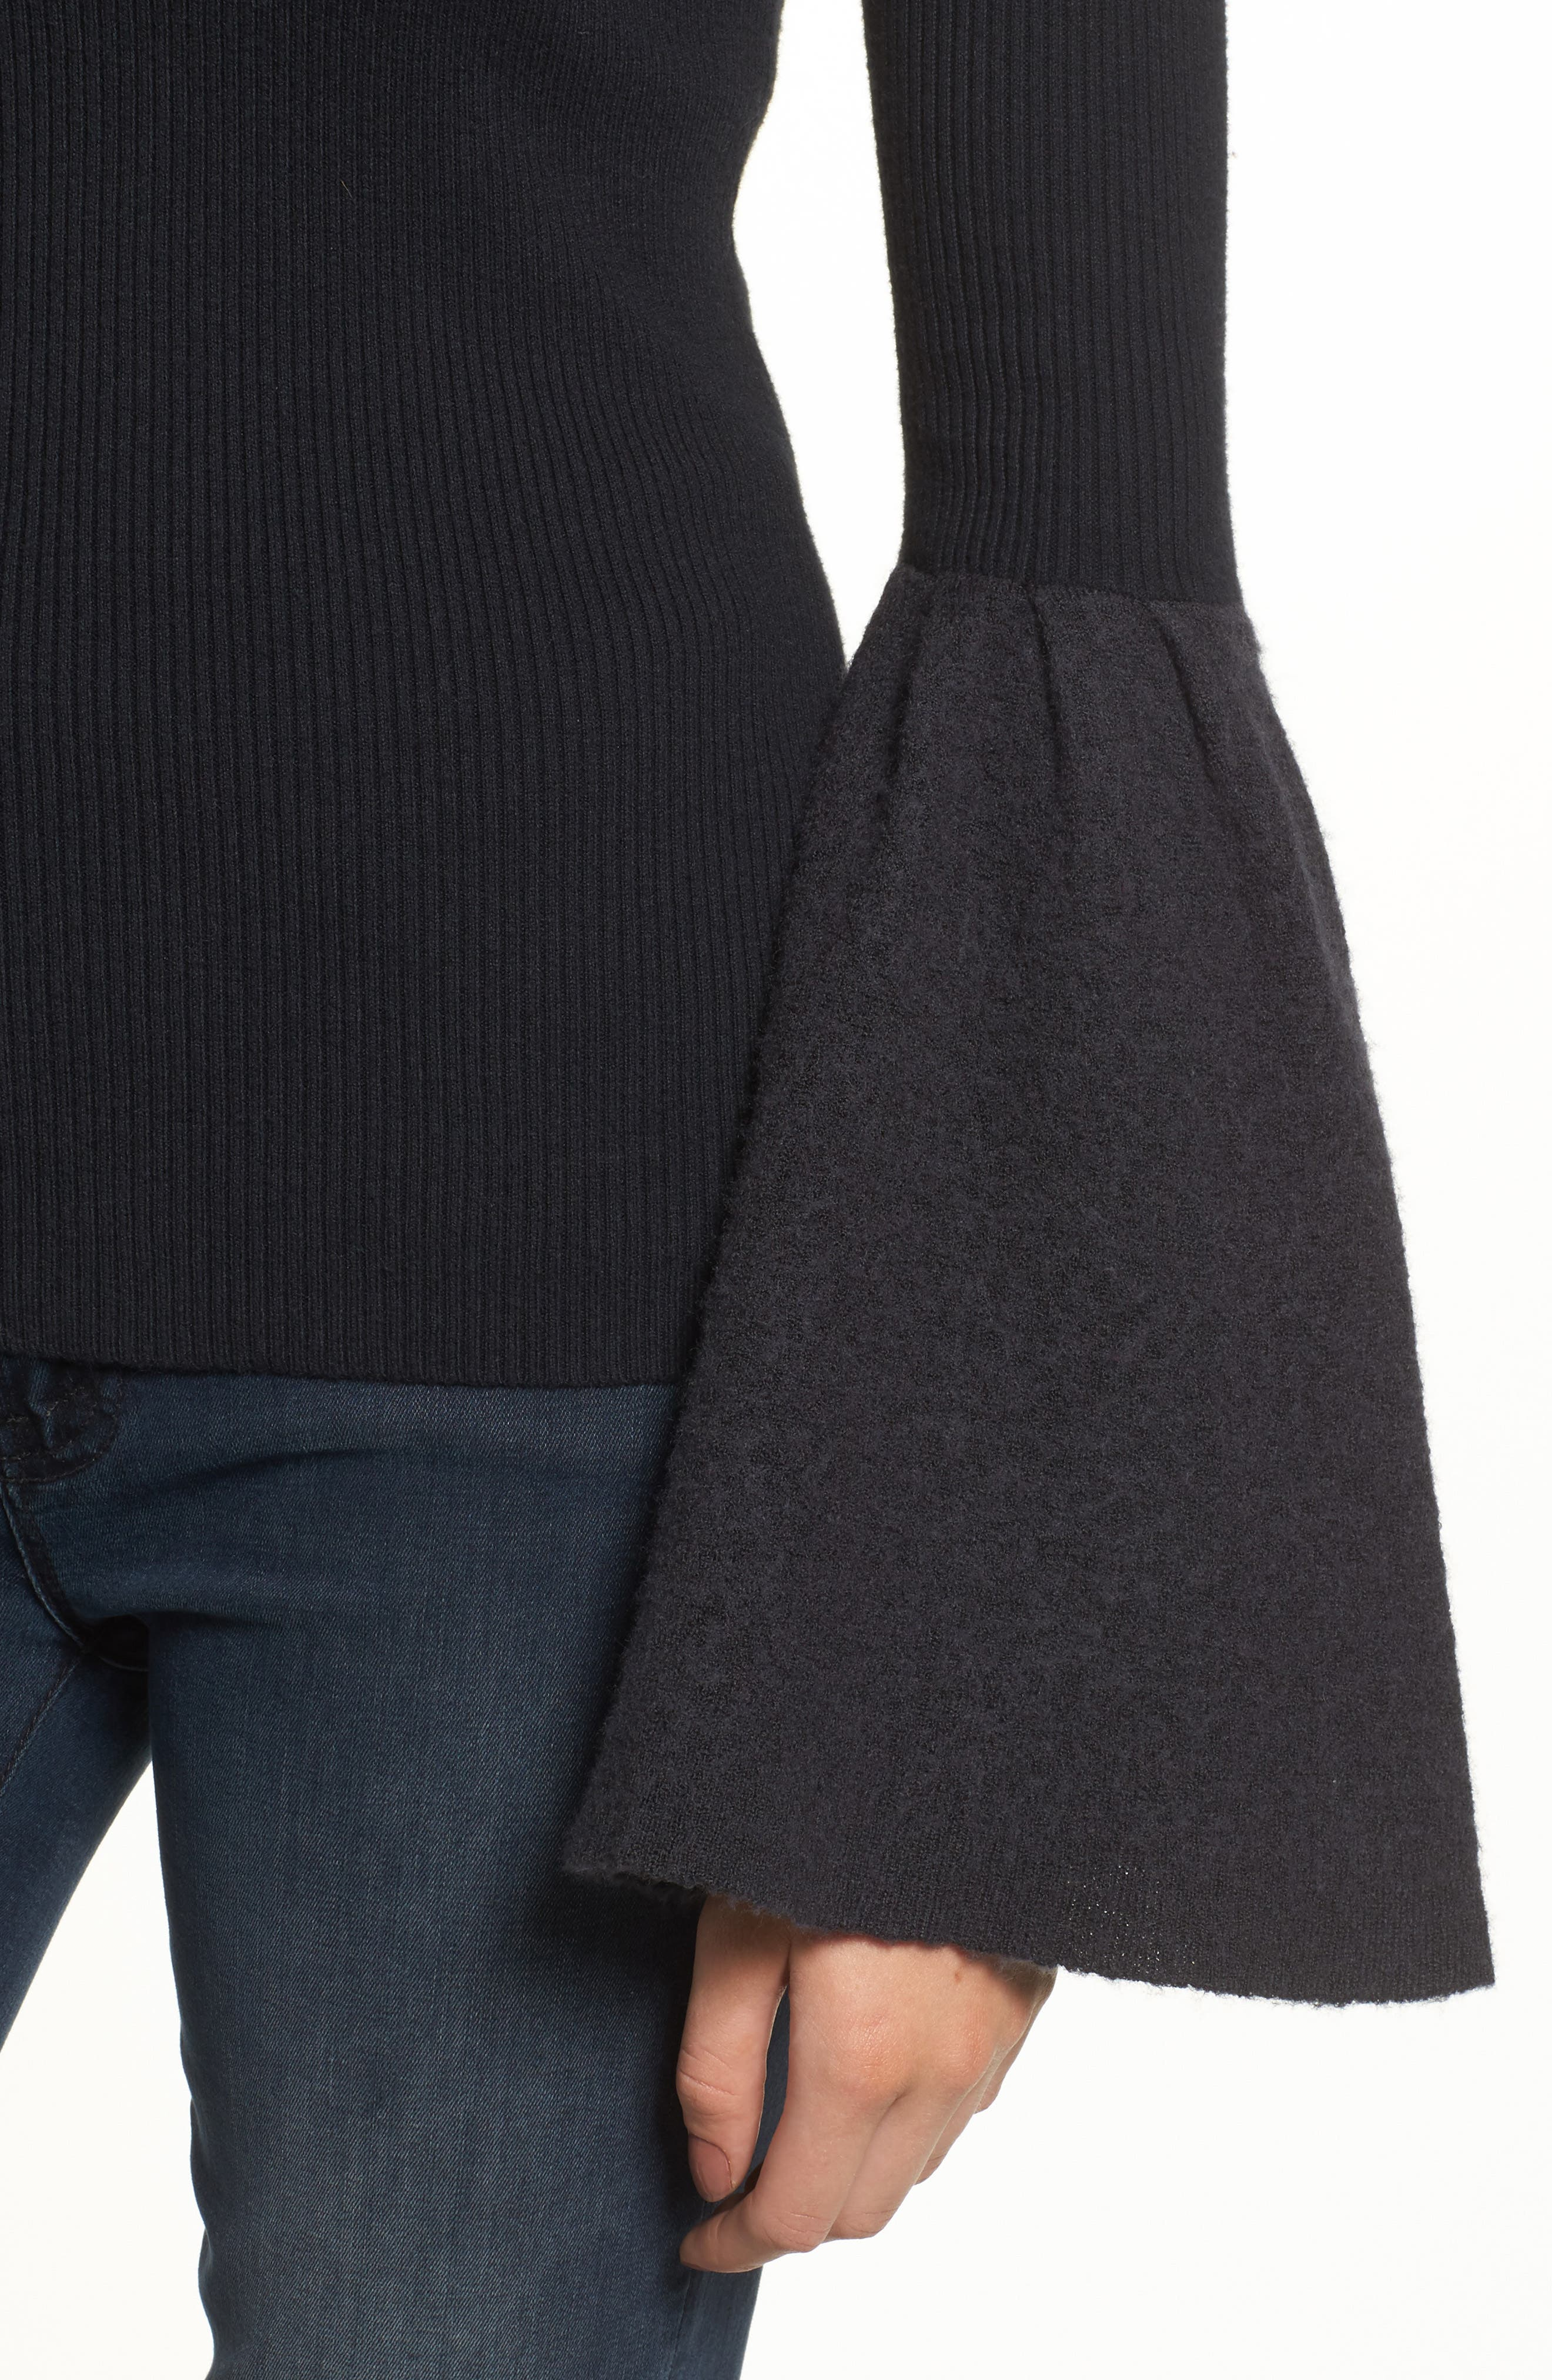 Bell Sleeve Sweater,                             Alternate thumbnail 4, color,                             Black- Grey Dark Heather Combo